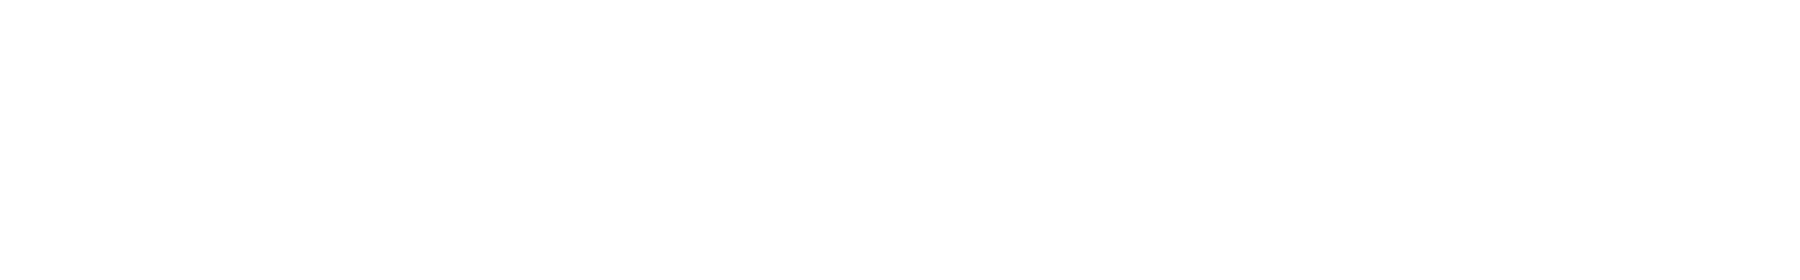 veh2 special sounds   03